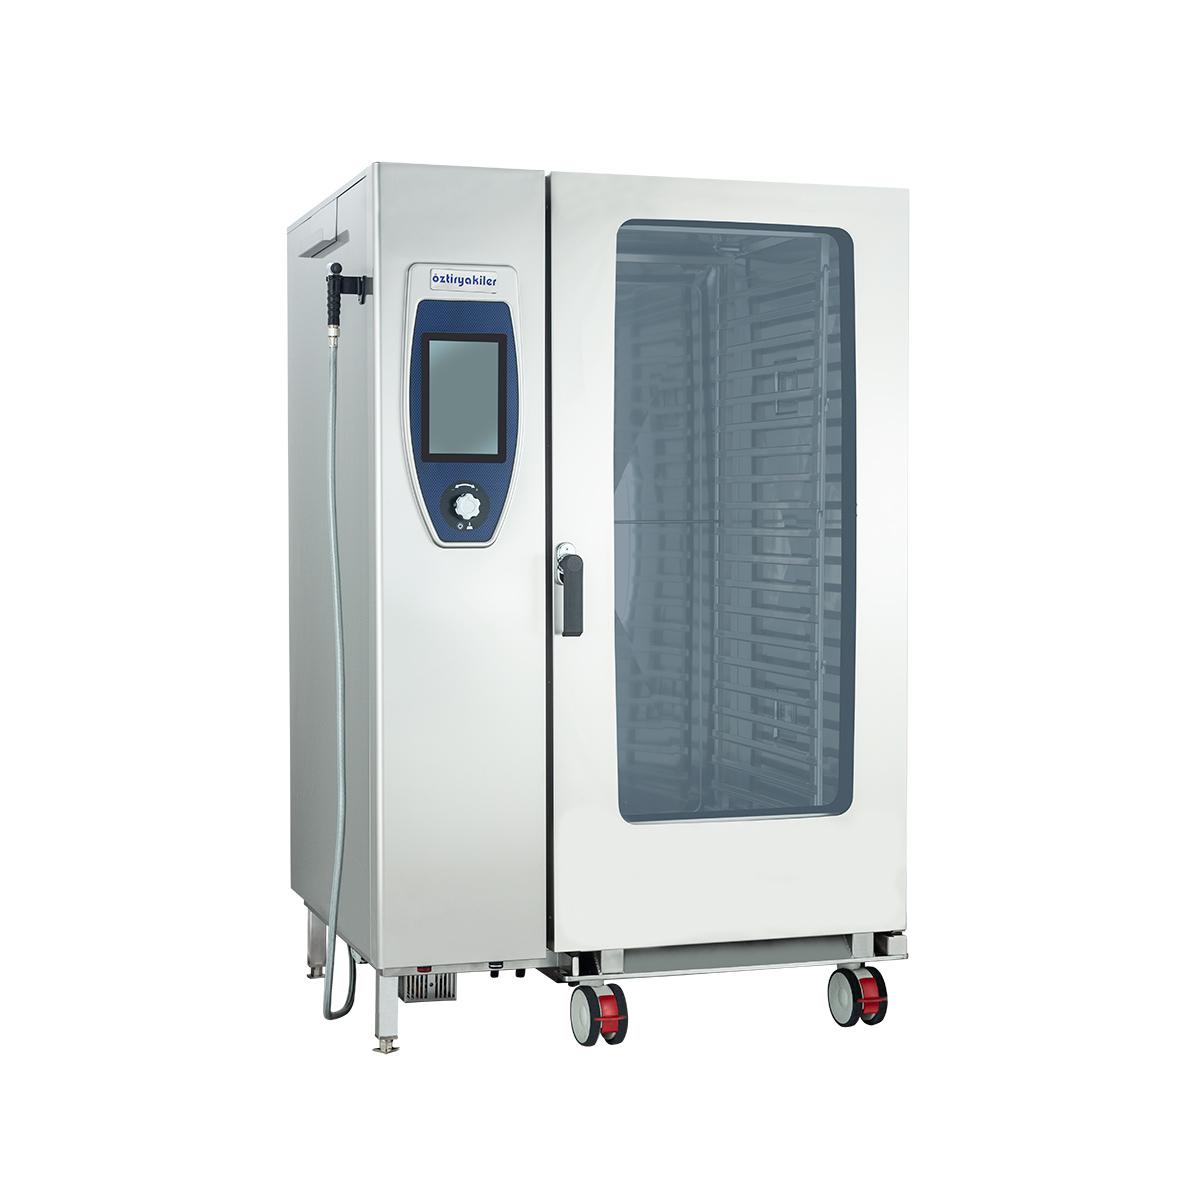 Elektrikli Kombi Fırın - 202 (40 x GN 1/1)